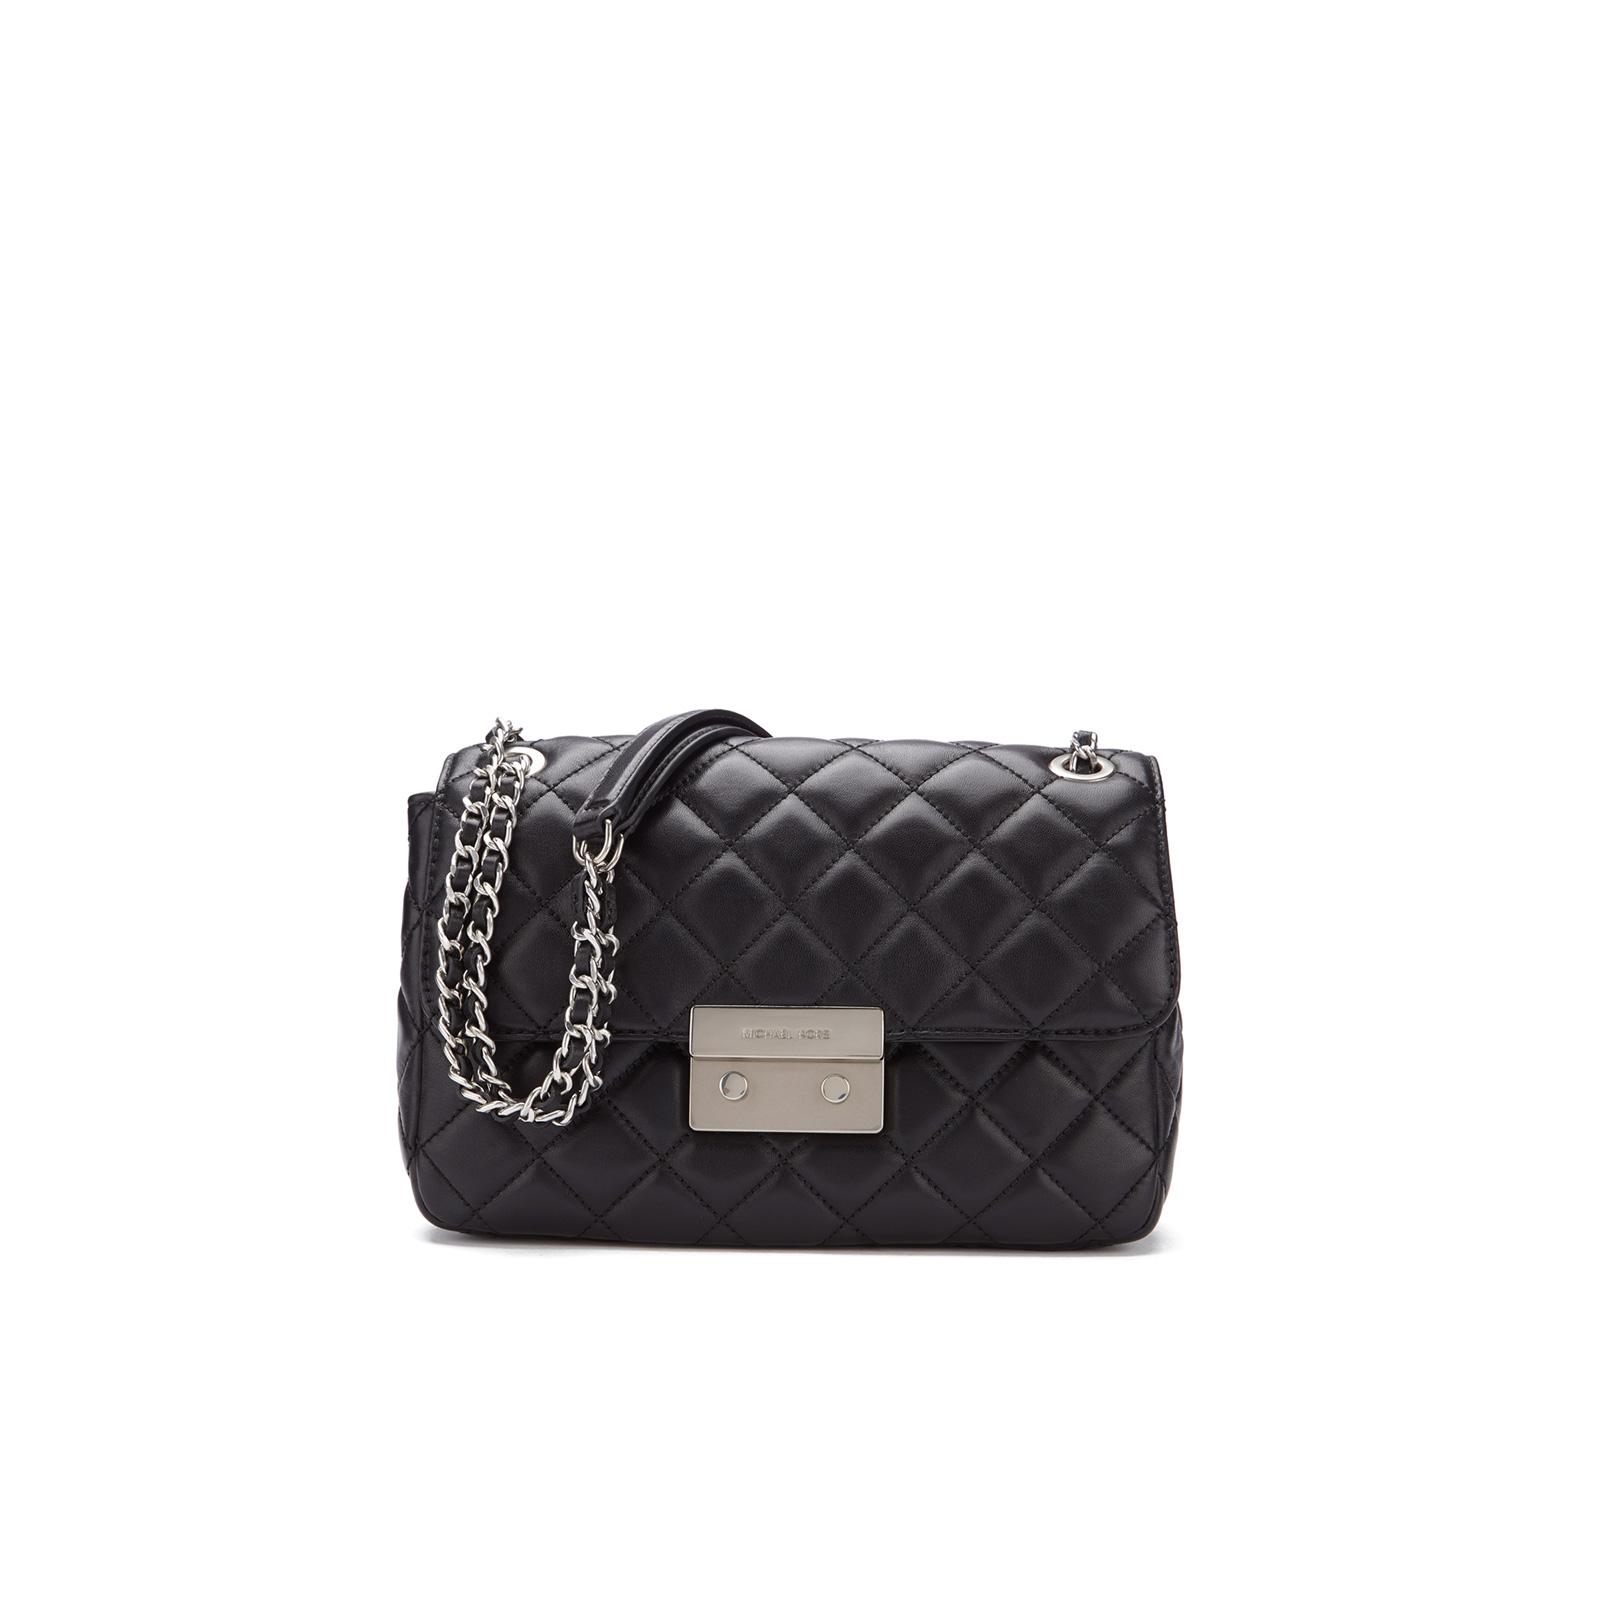 e6077fa4cf0b7 MICHAEL MICHAEL KORS Women s Sloane Large Chain Shoulder Bag - Black ...